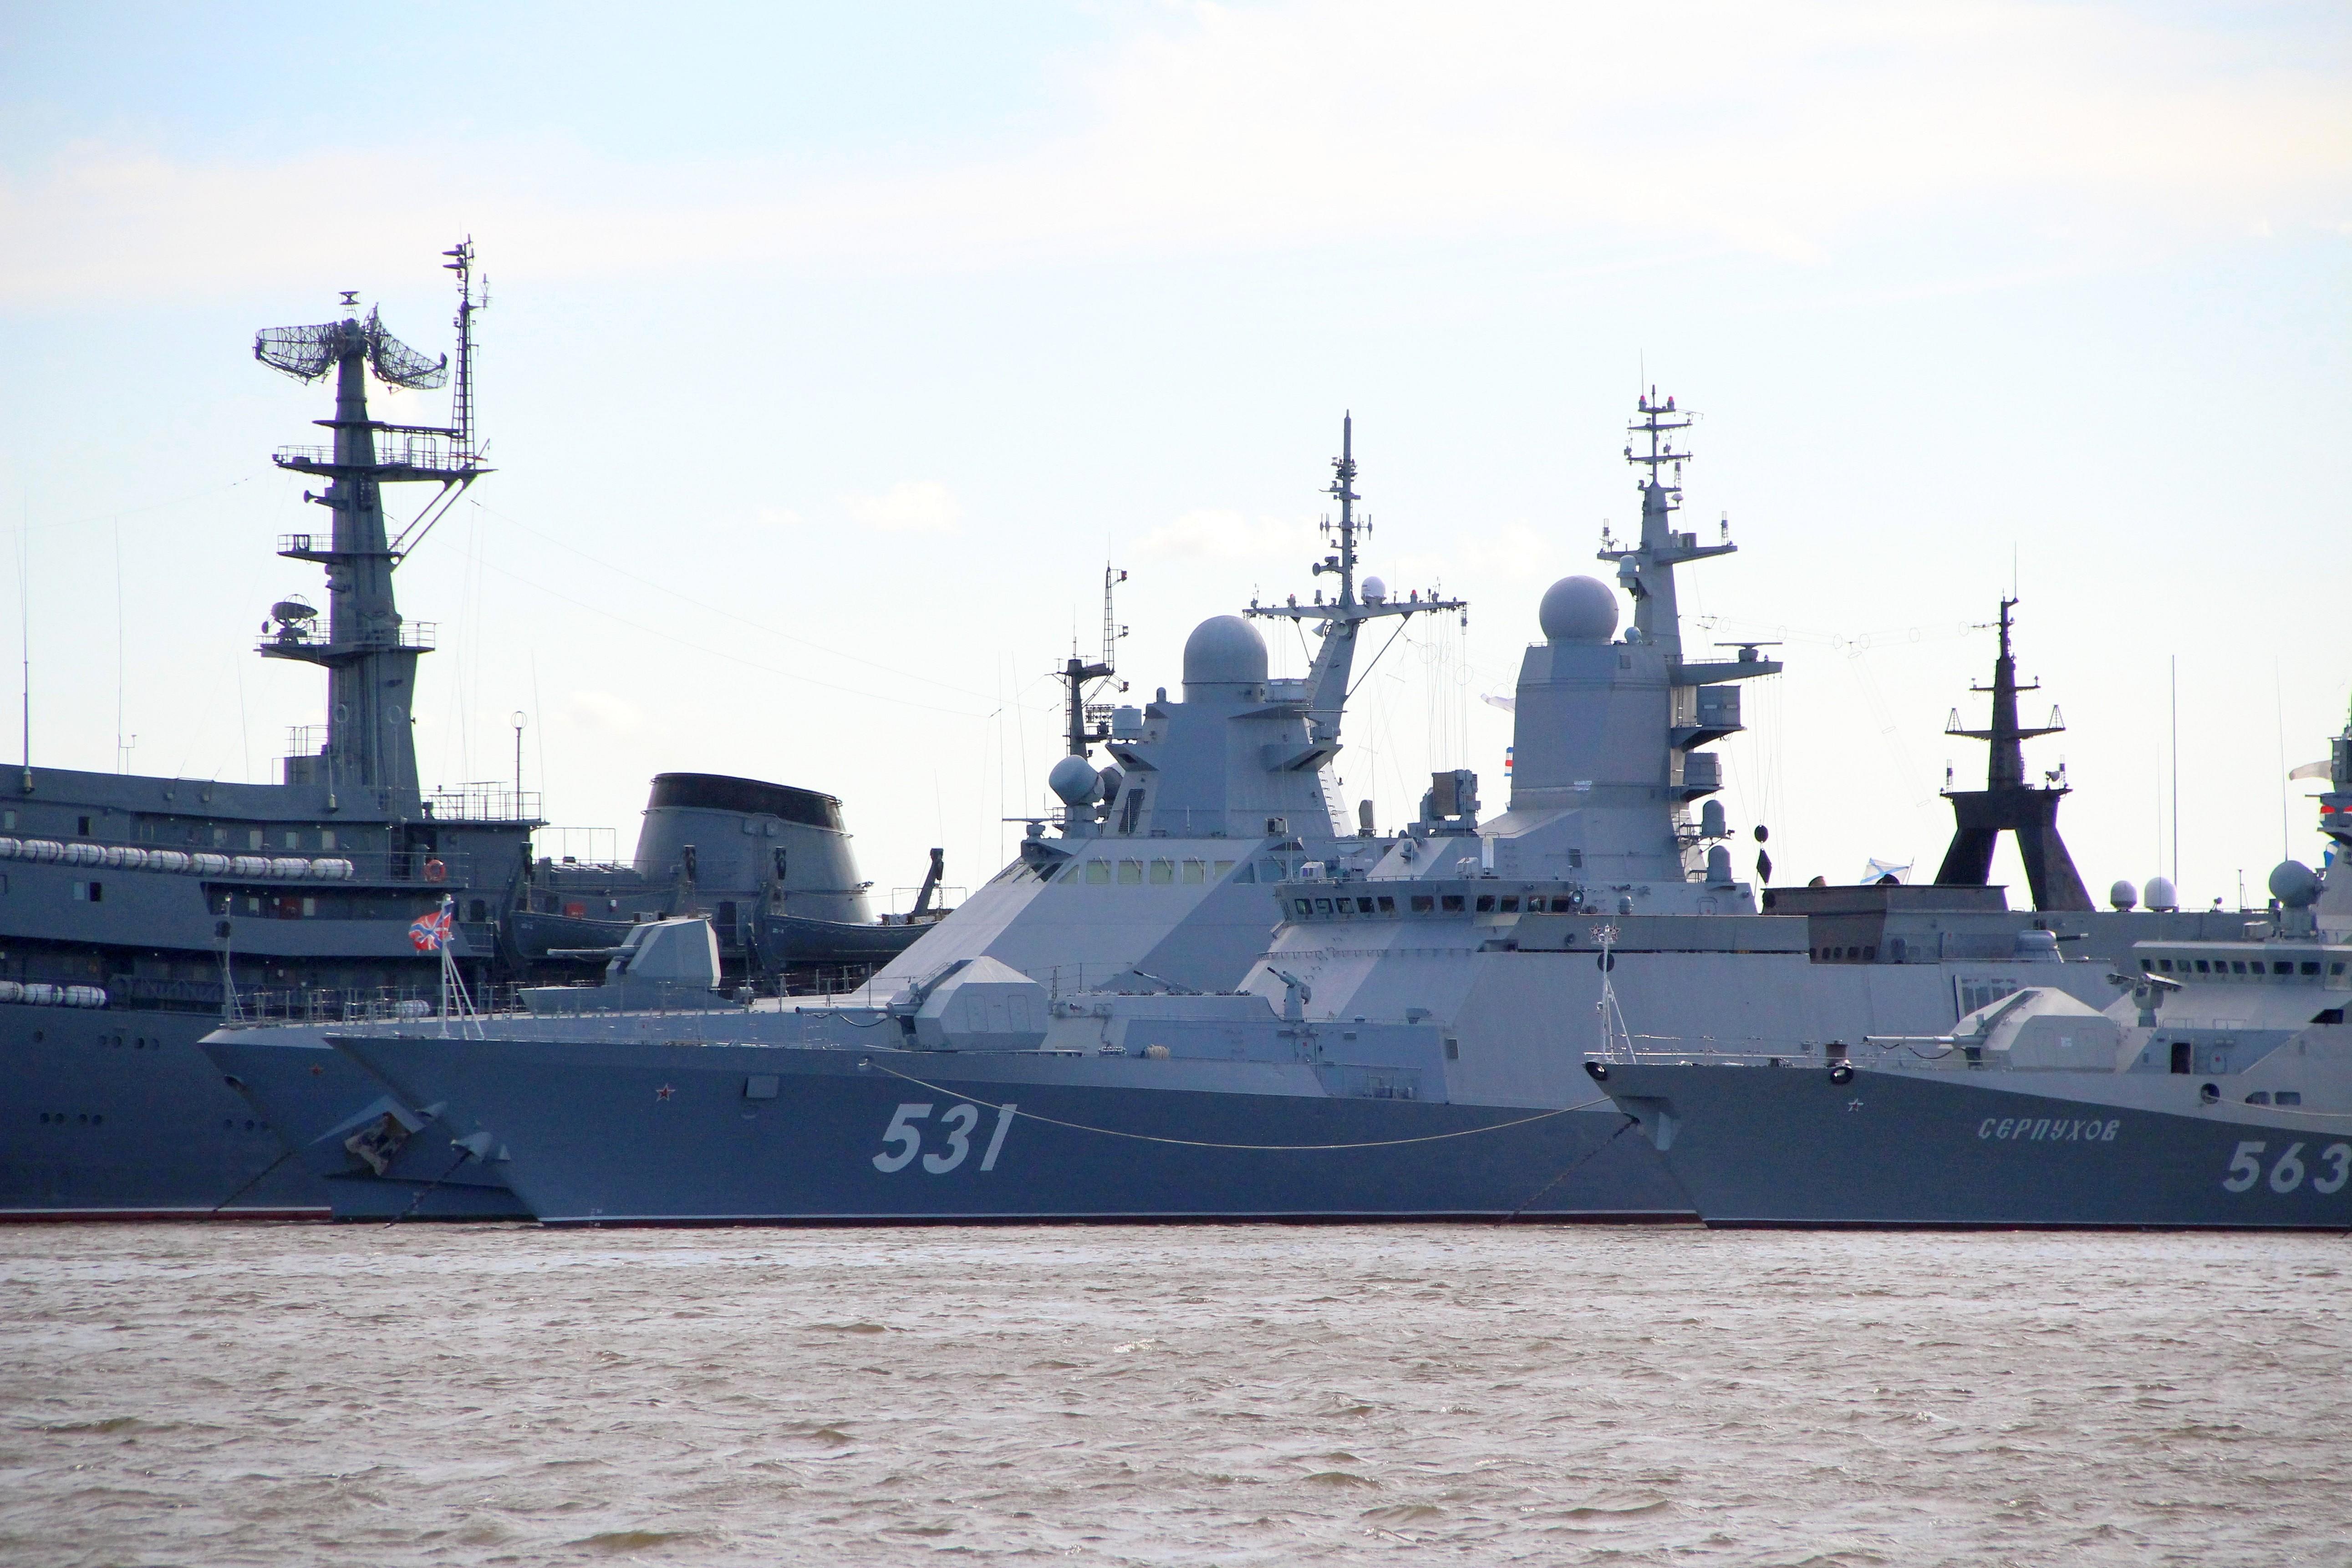 Project 22160 Bykov-class patrol ship - Page 21 04-7653453-22160-vasilij-bykov-kronshtadt-04.07.2019